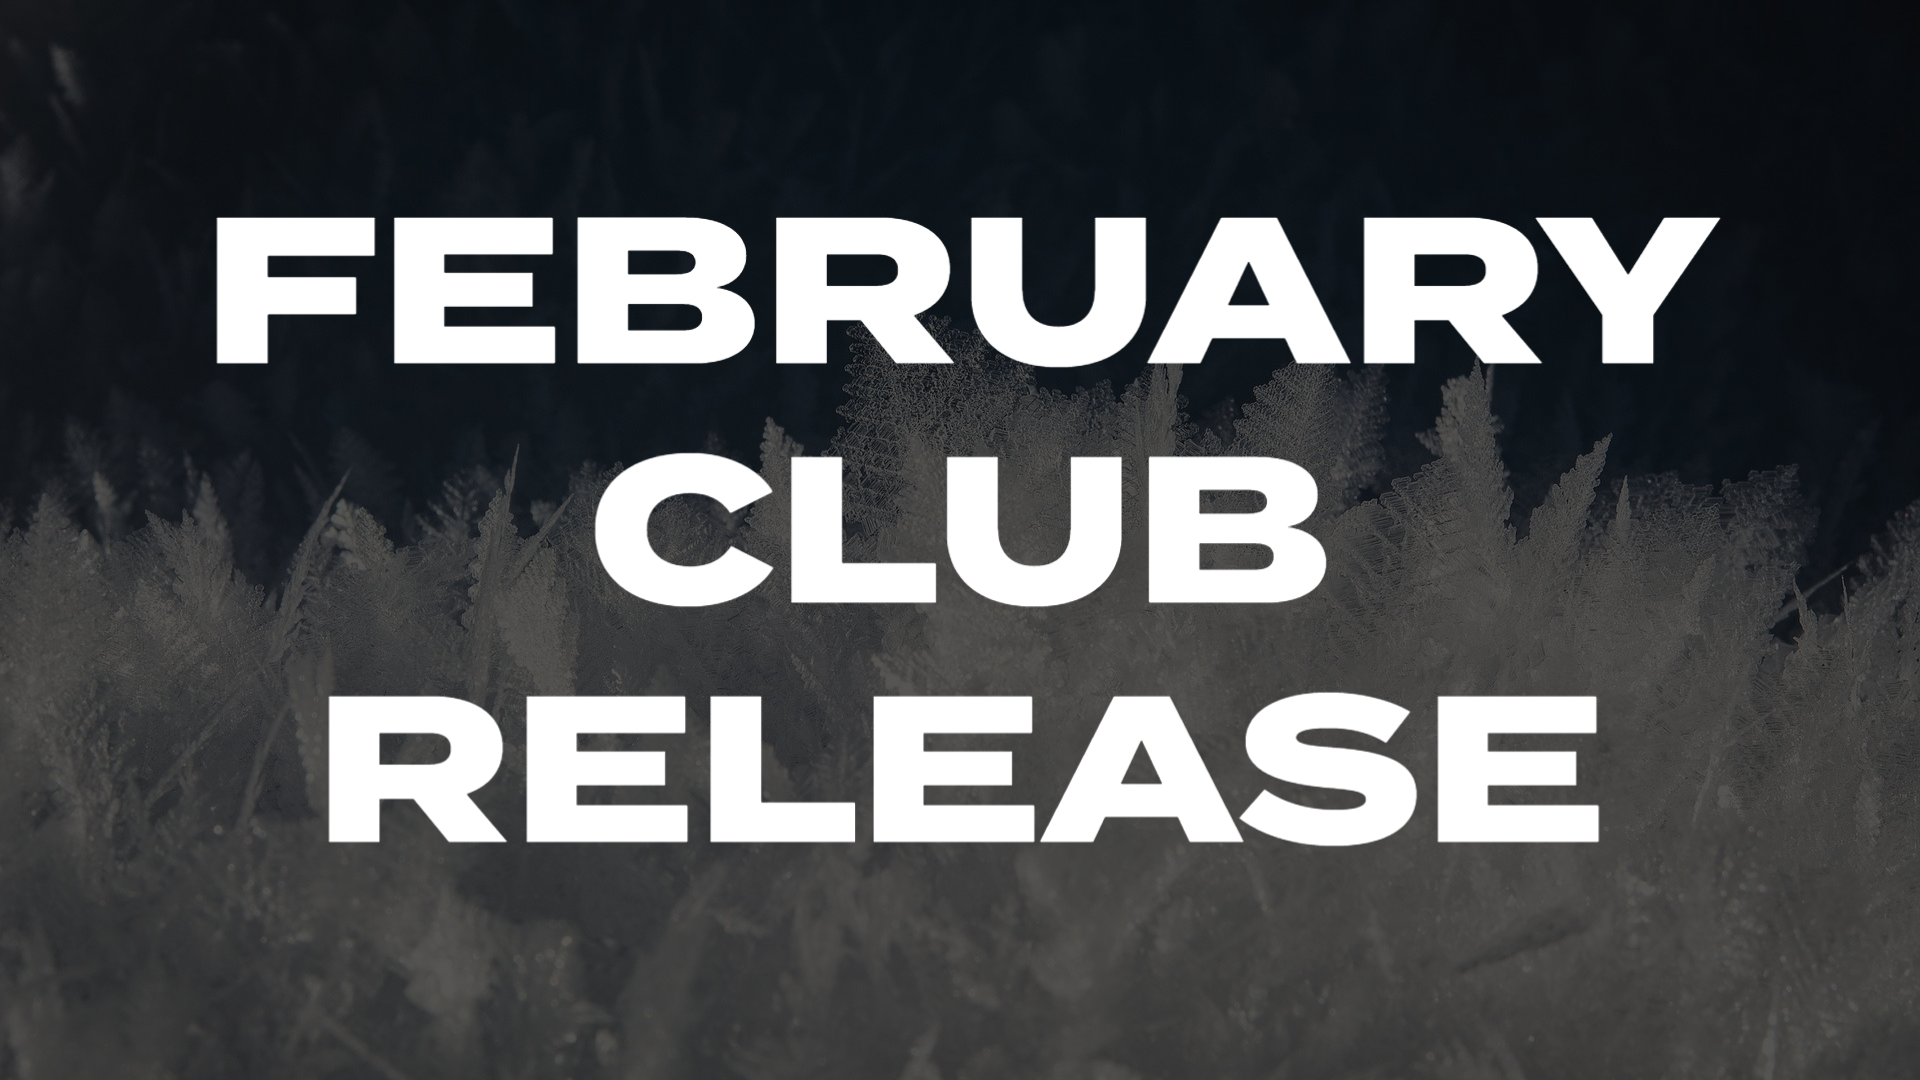 FEBRUARY INFINITY CLUB RELEASE